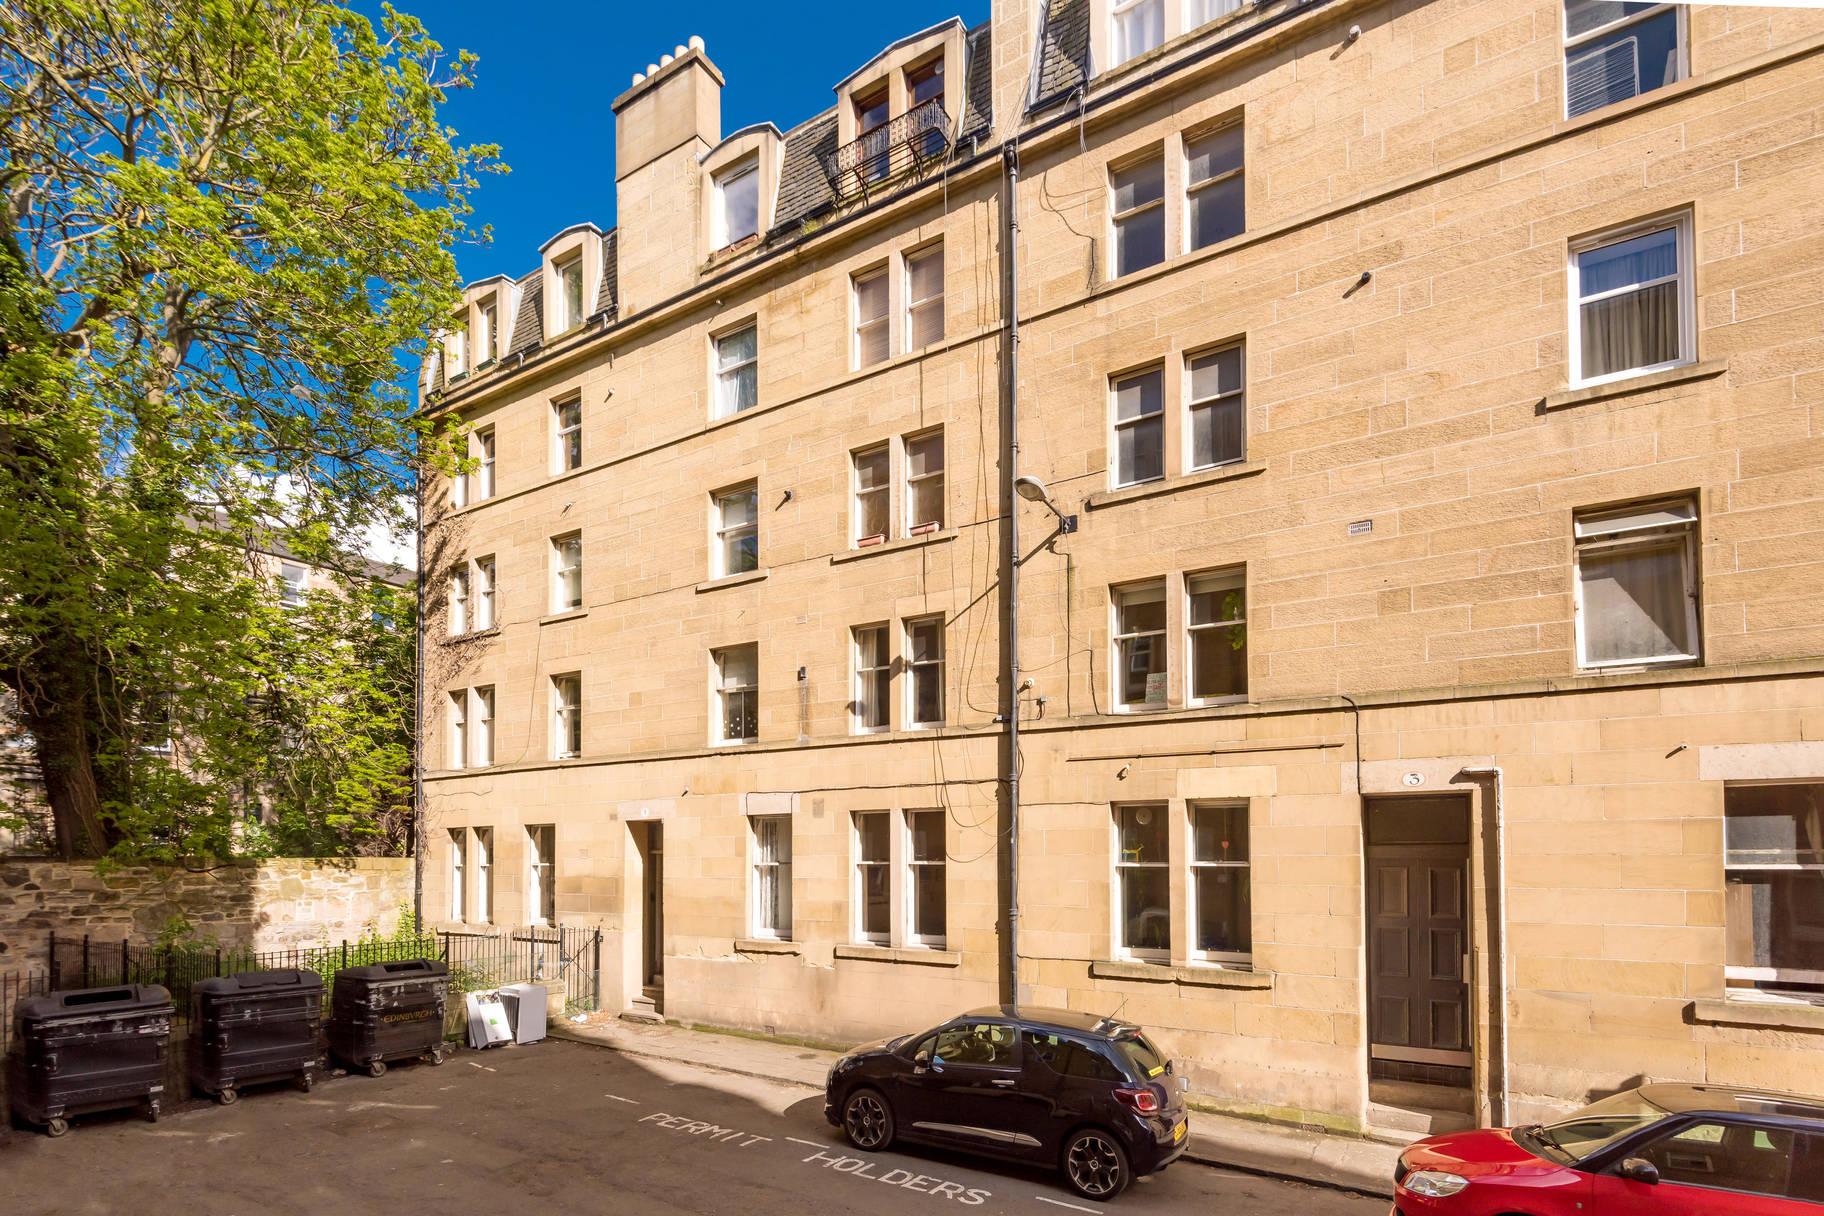 5/5 Buccleuch Terrace, Edinburgh, EH8 9NB